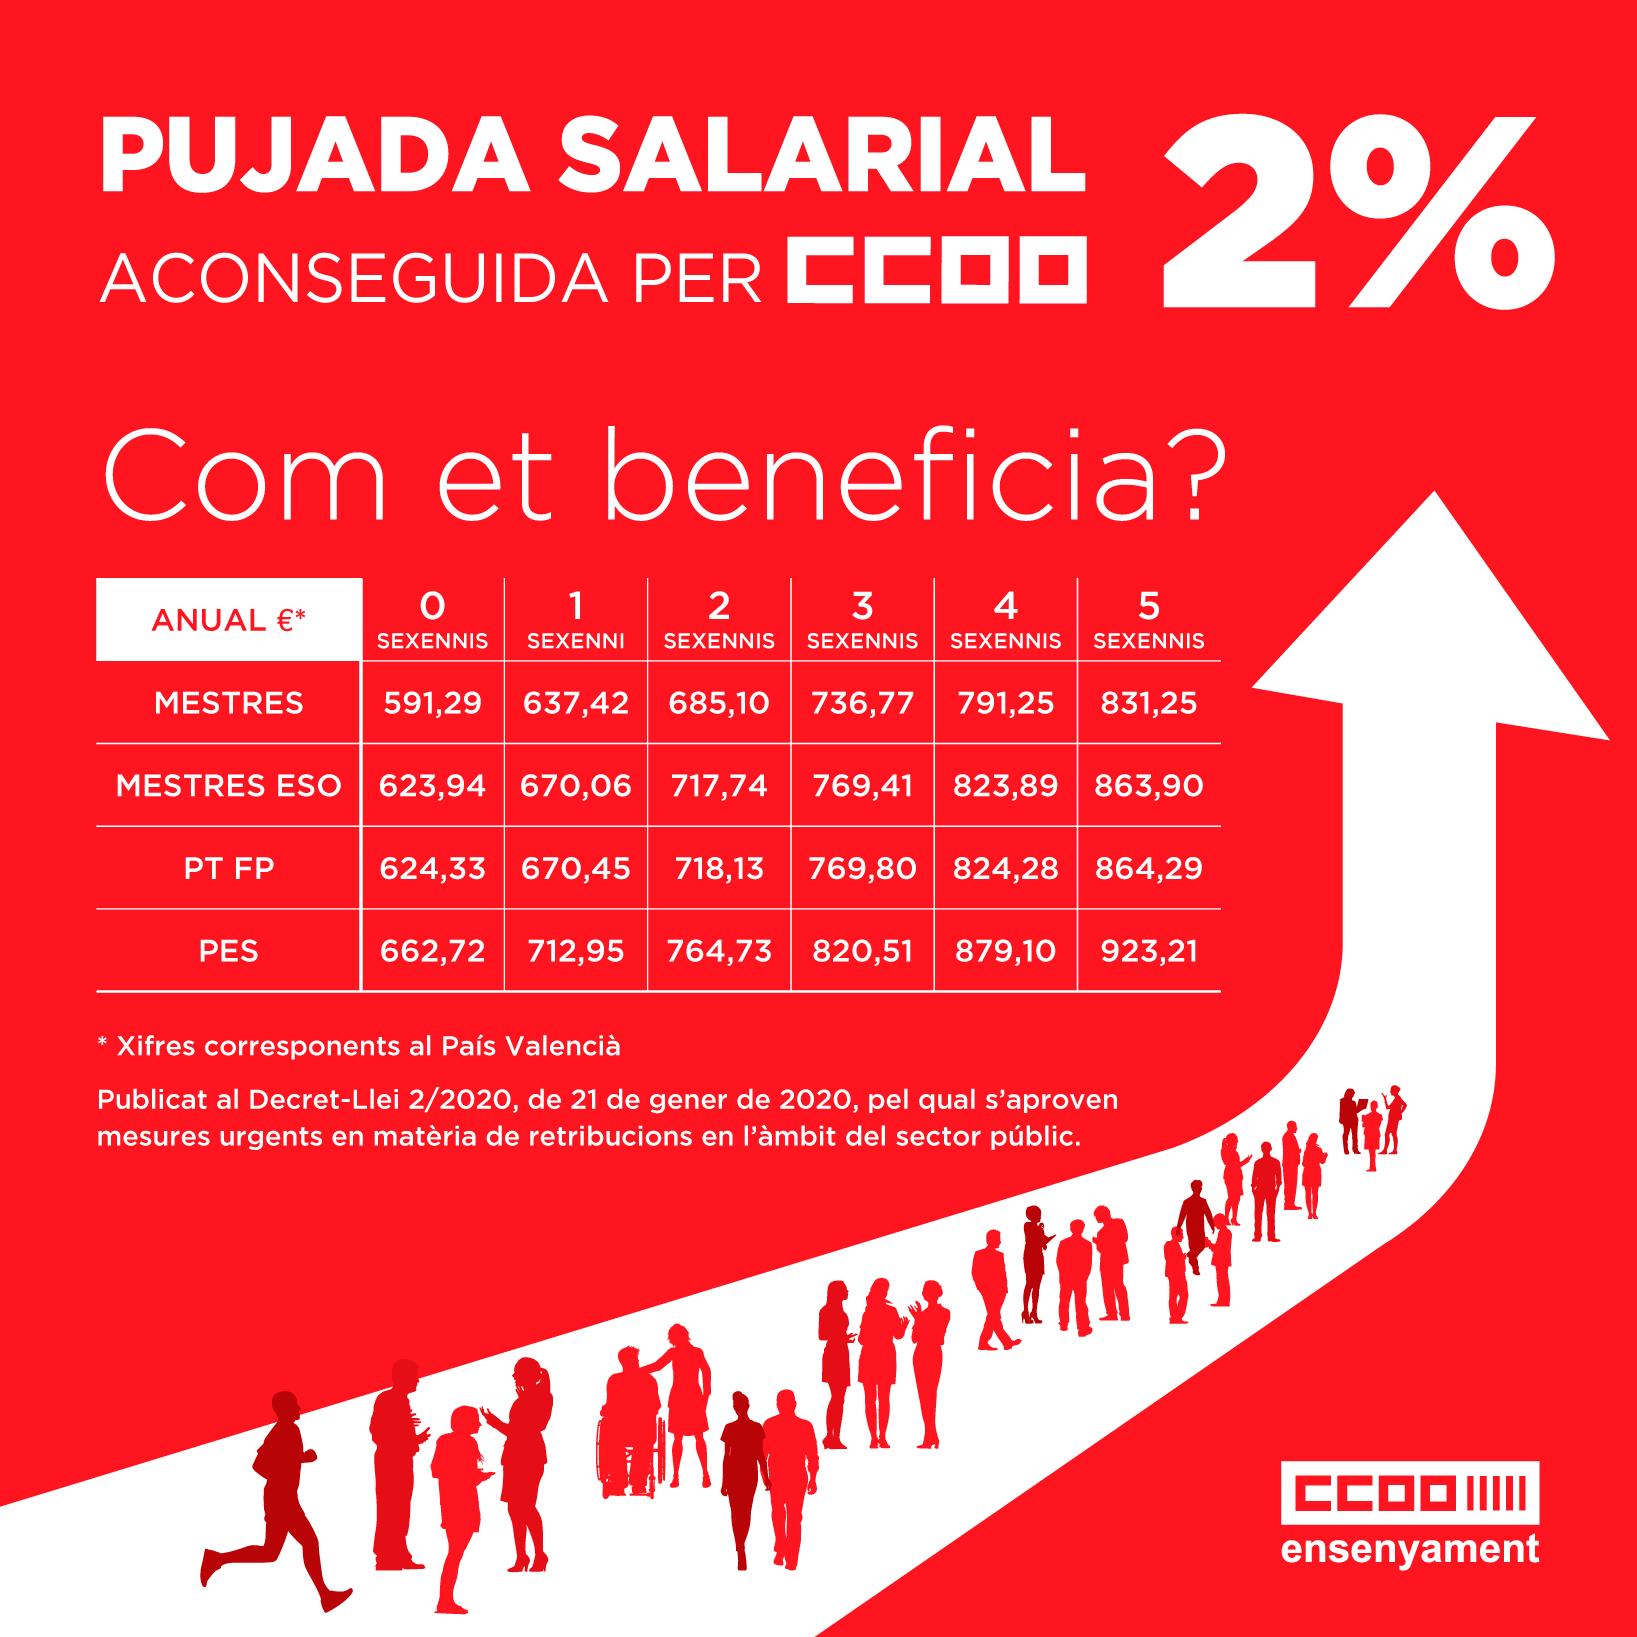 Pujada salarial 2%